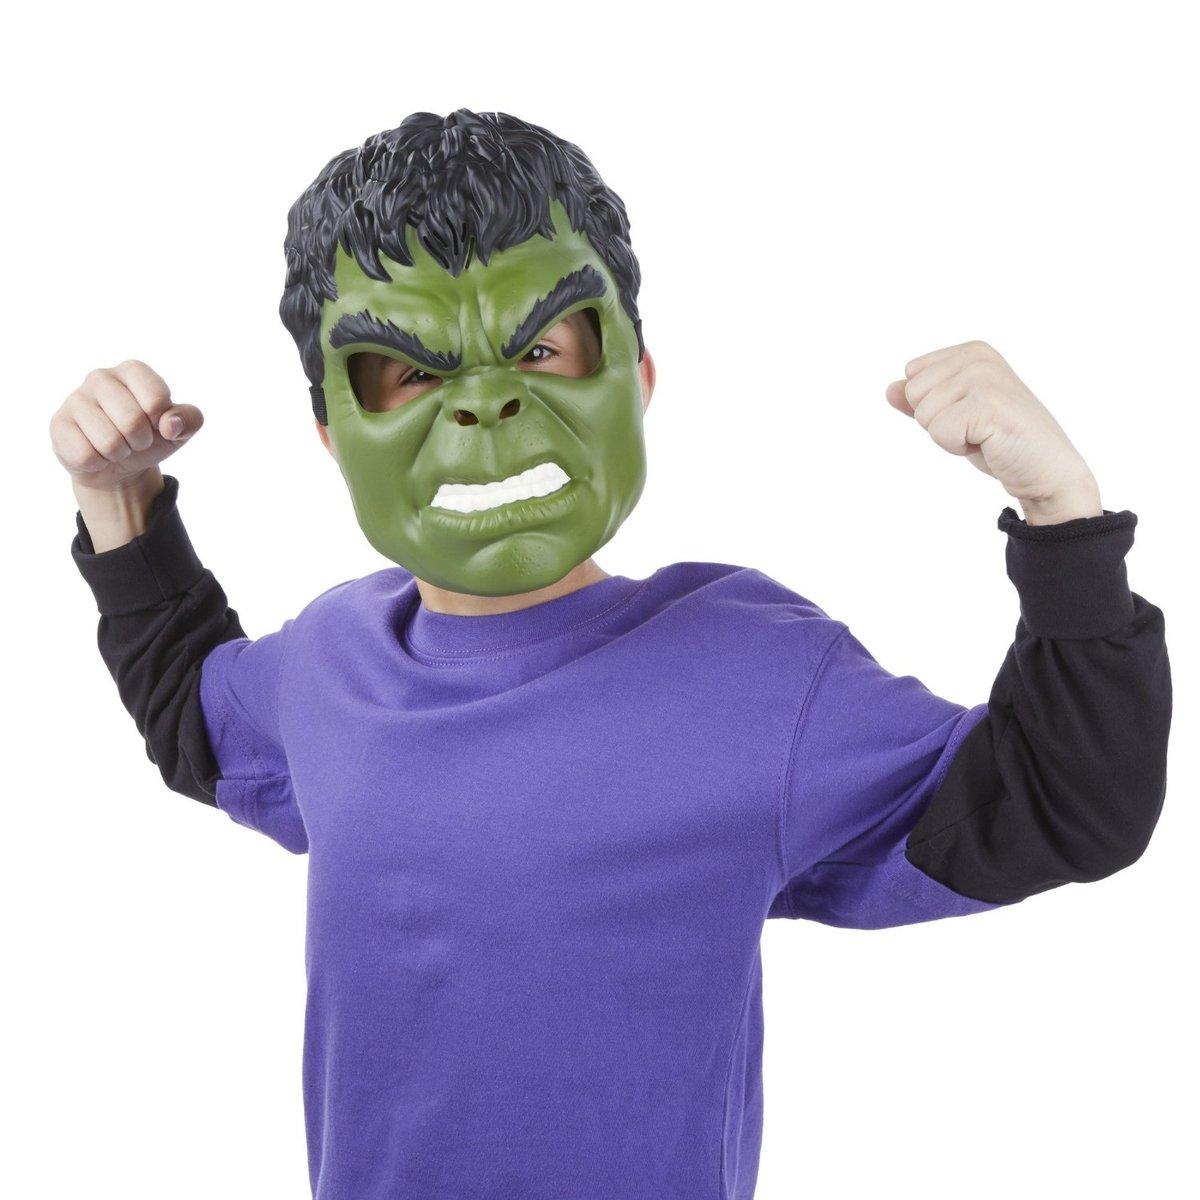 Avengers, maska Hulk z syntezatorem mowy, B1489